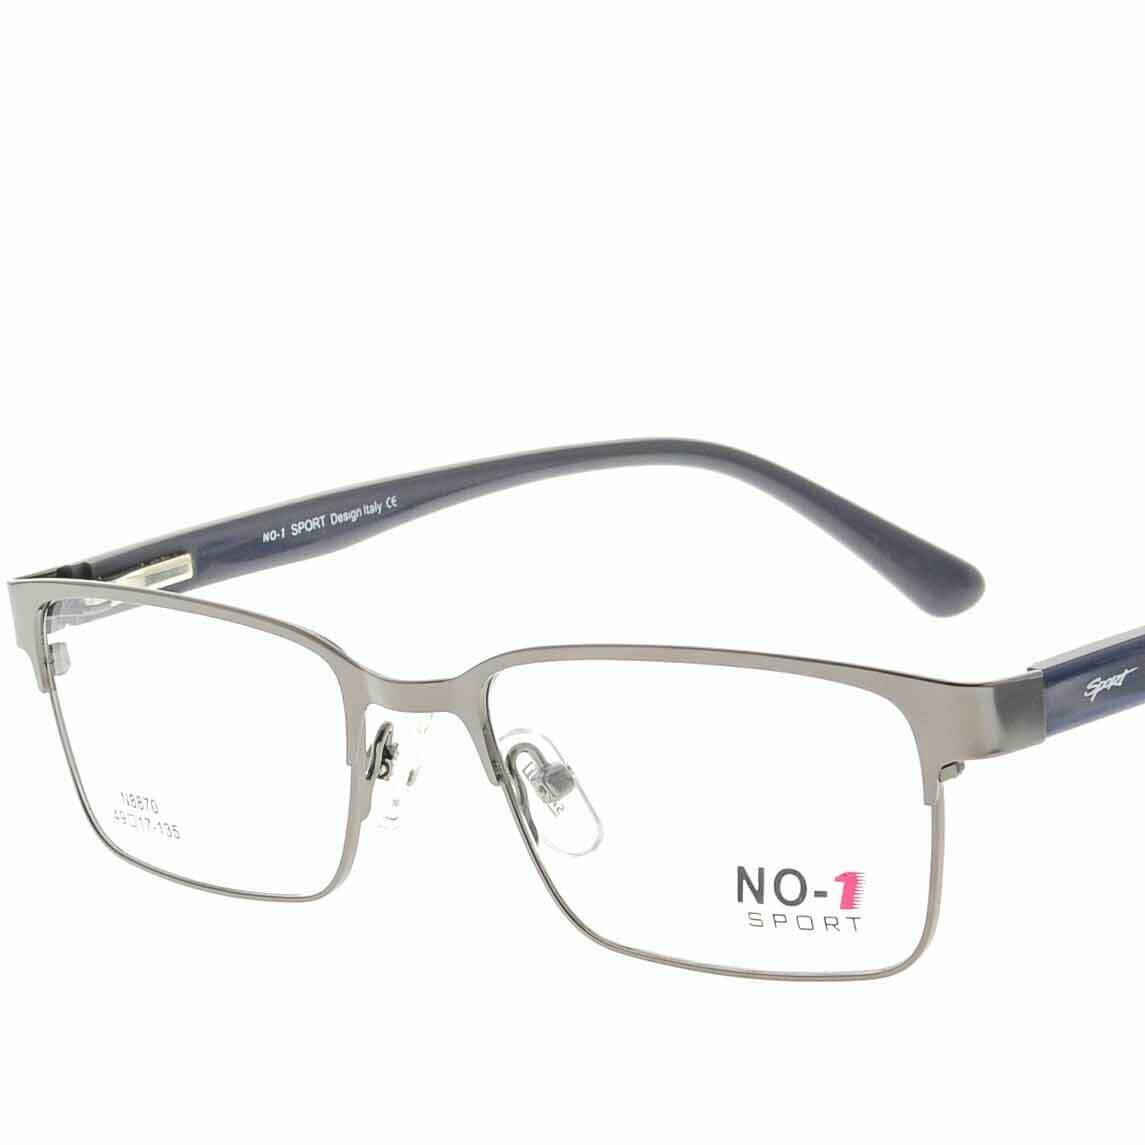 NO-1 SPORT N8870